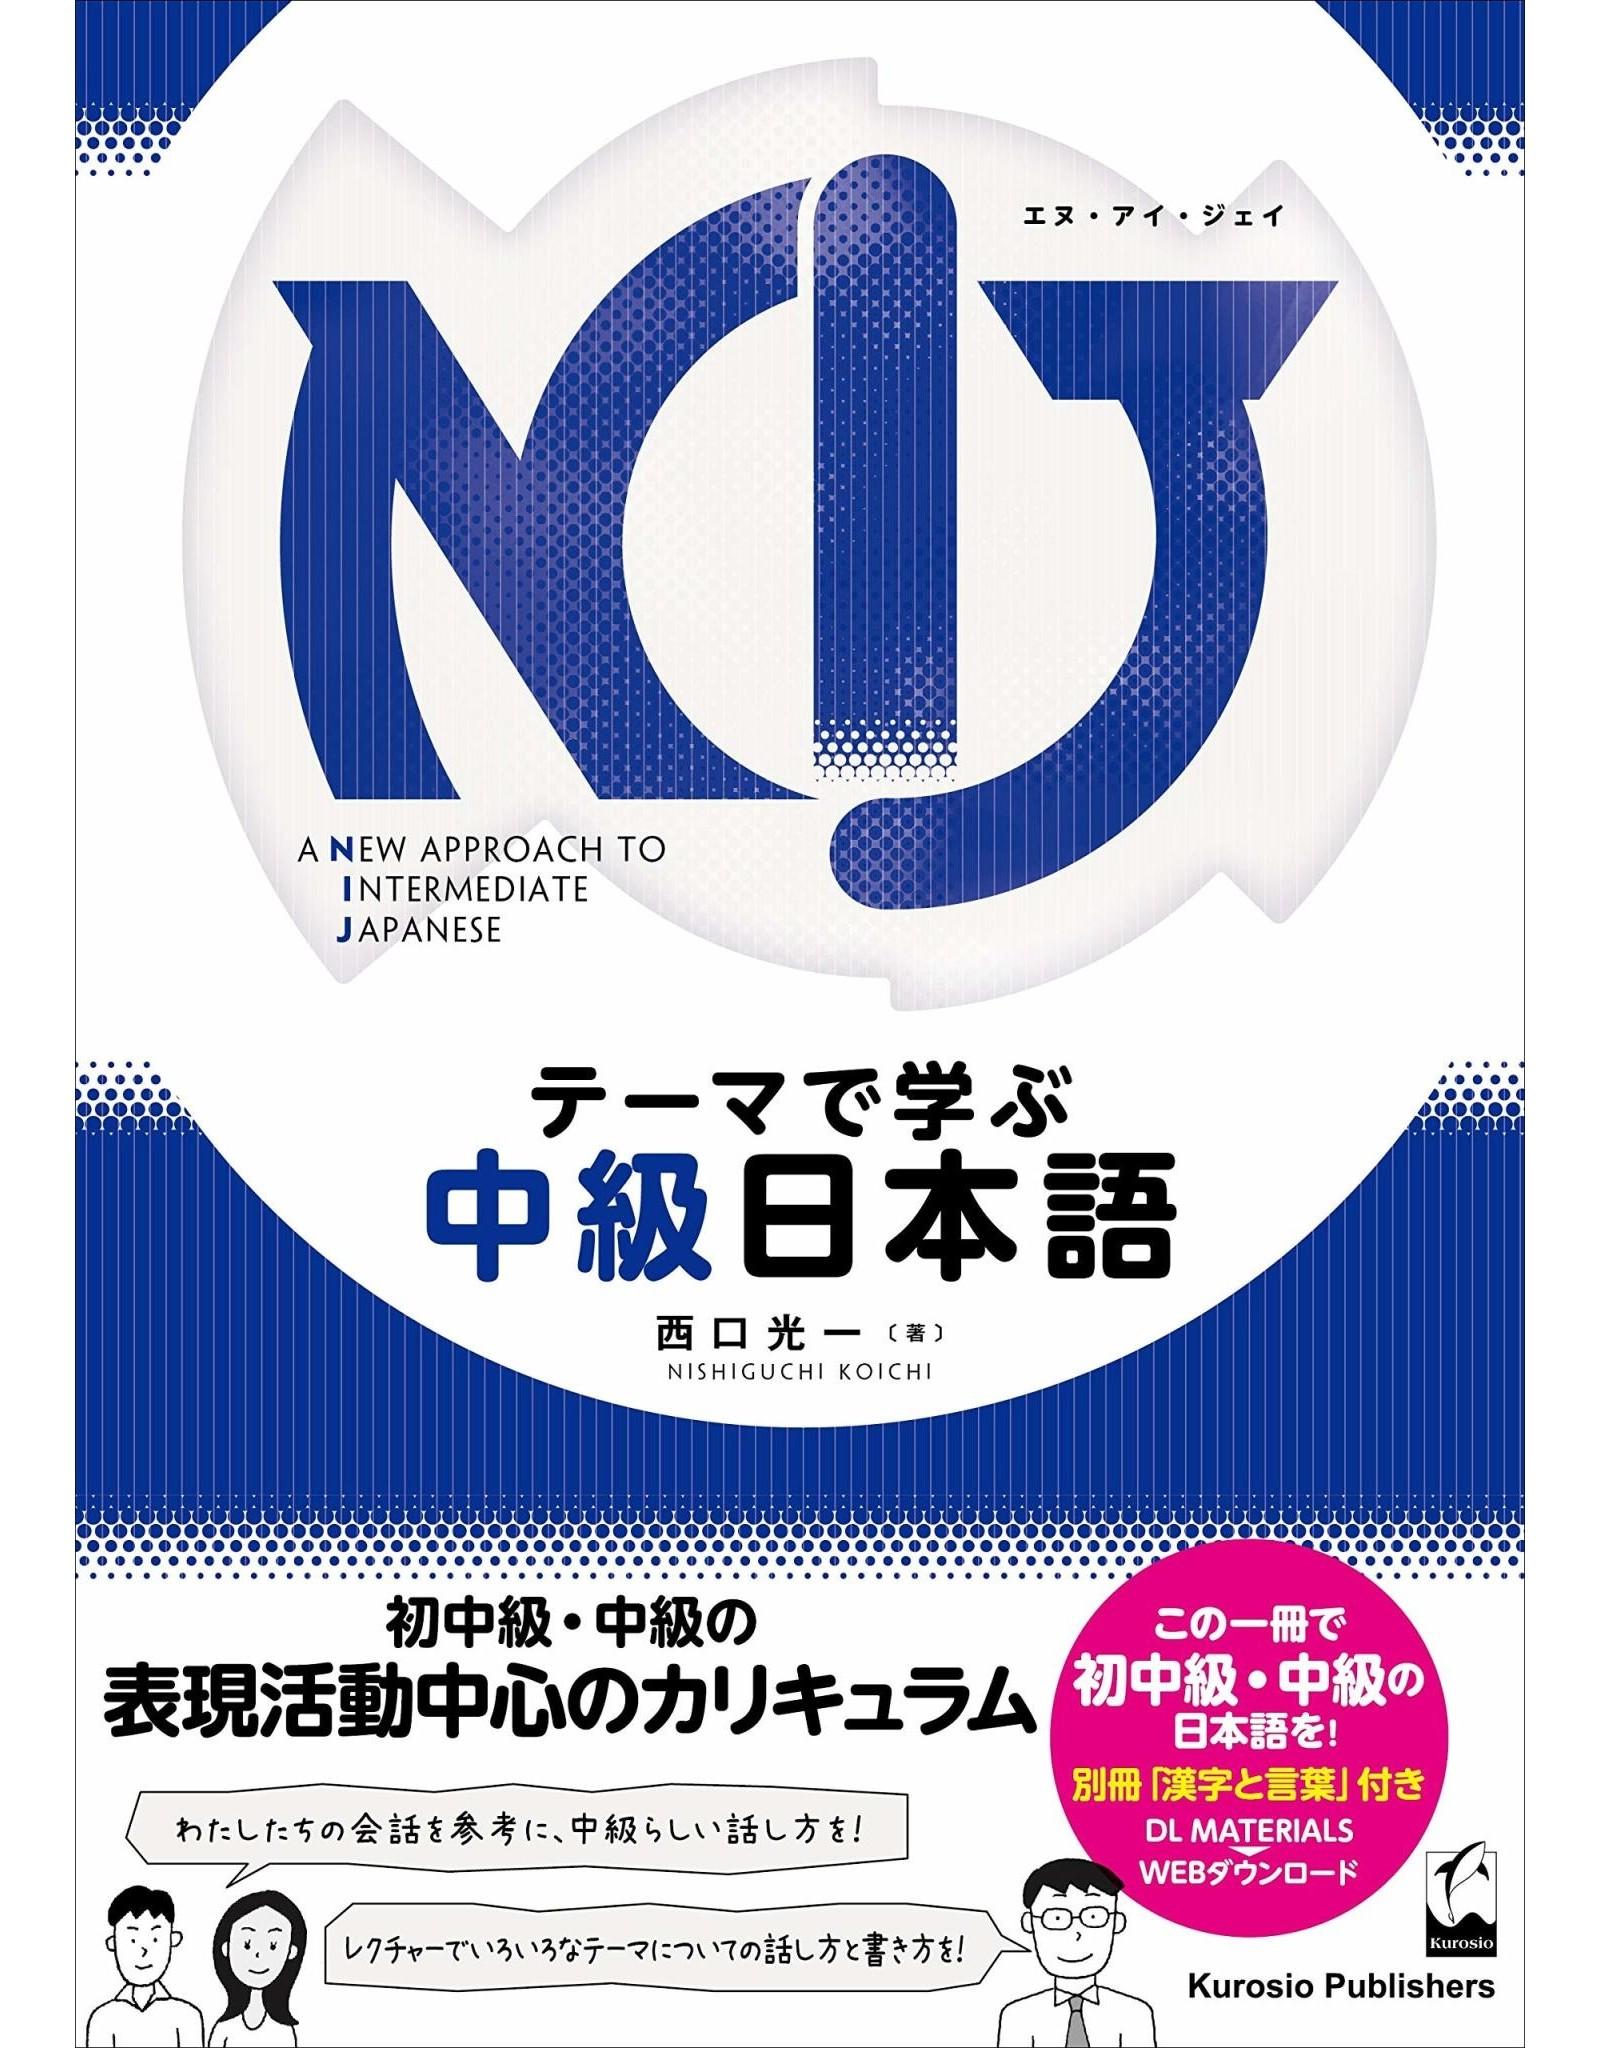 KUROSHIO A NEW APPROACH TO INTERMEDIATE JAPANESE NIJ CHUKYU NIHONGO